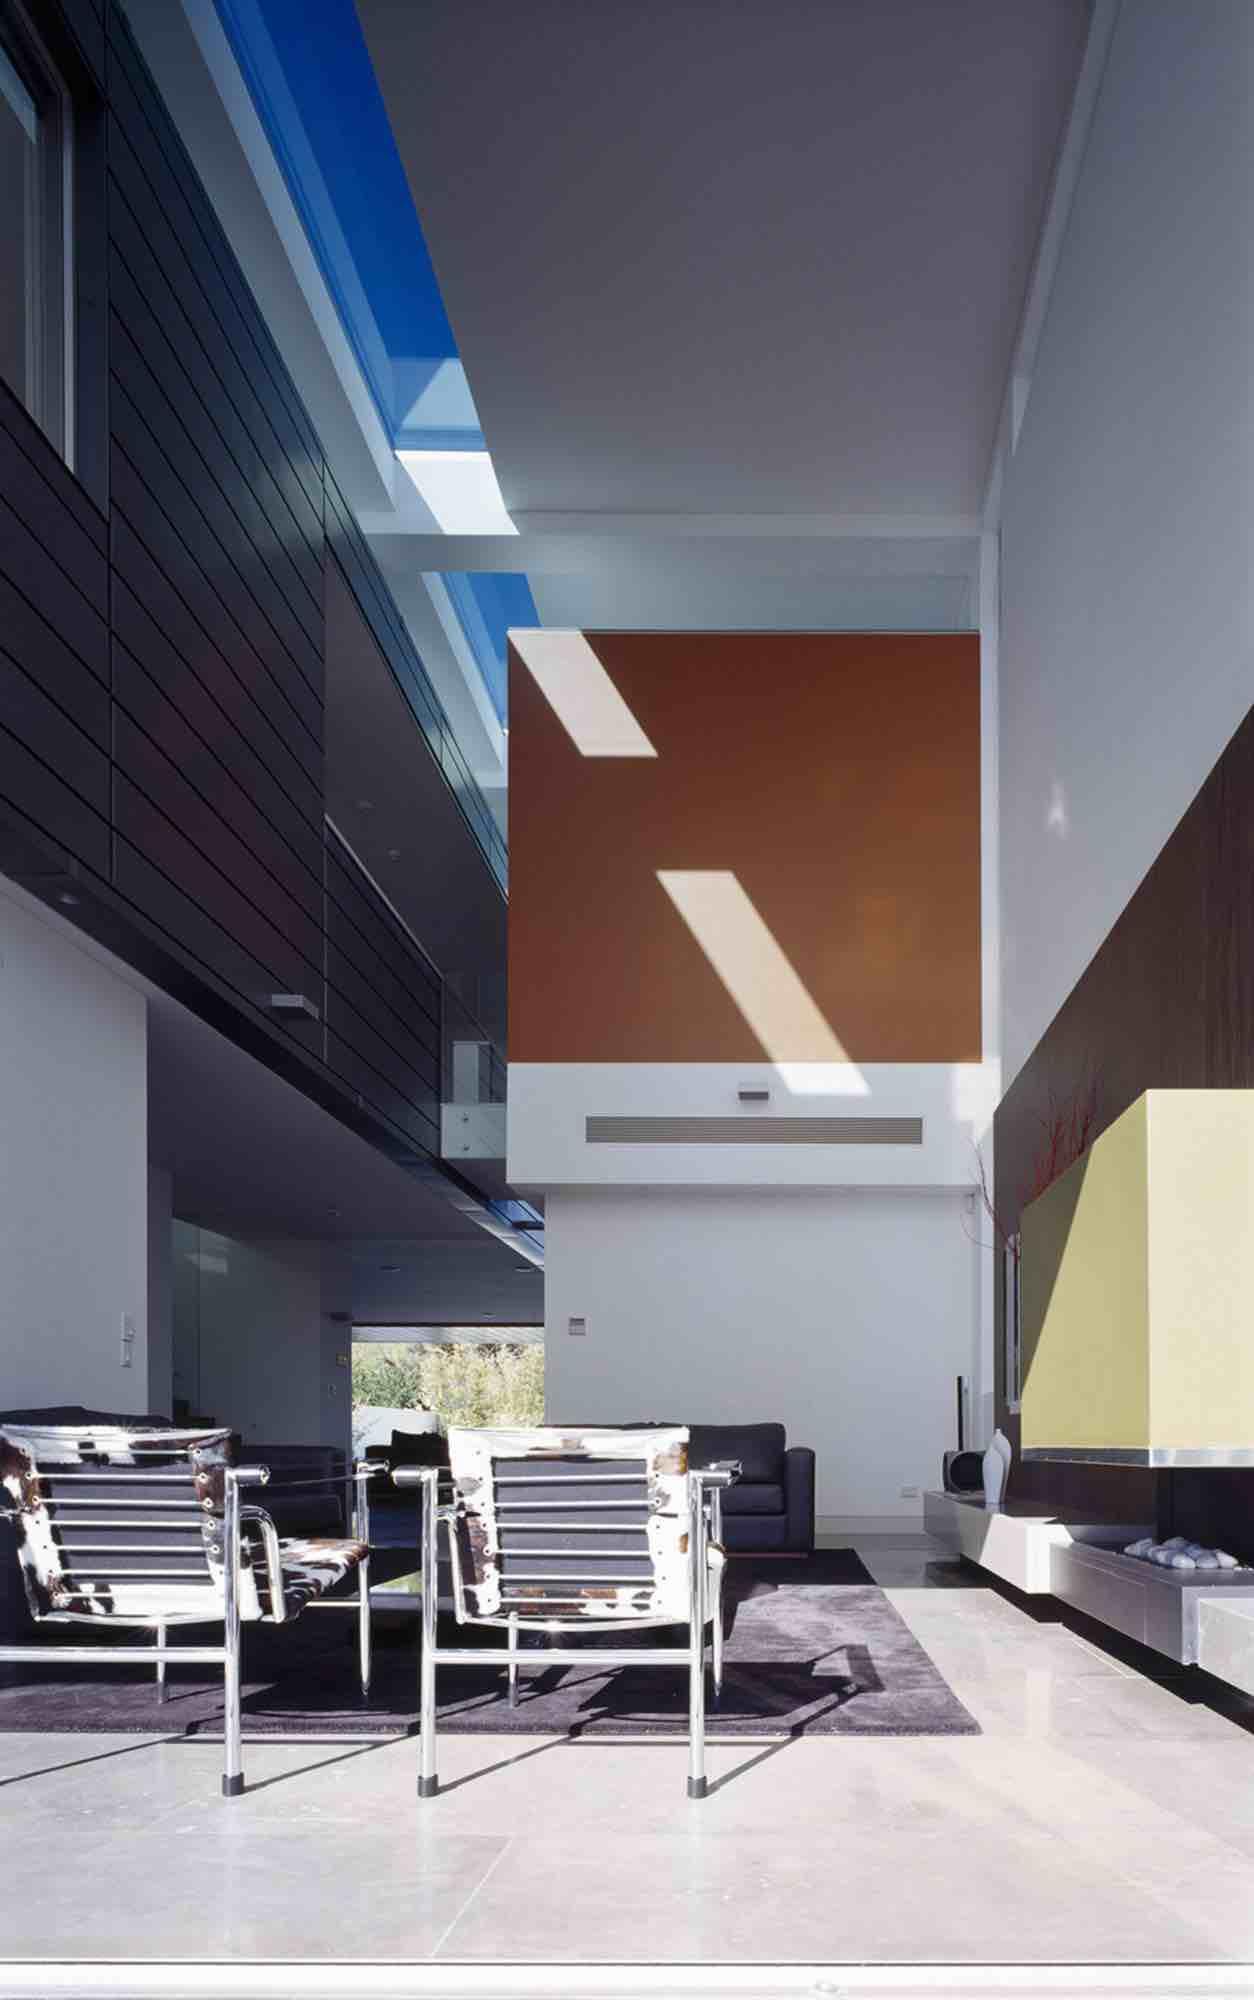 minosa-design-high-voids-sitting-room-modern-custom-joinery-gas-fireplace-limestone-floor-01